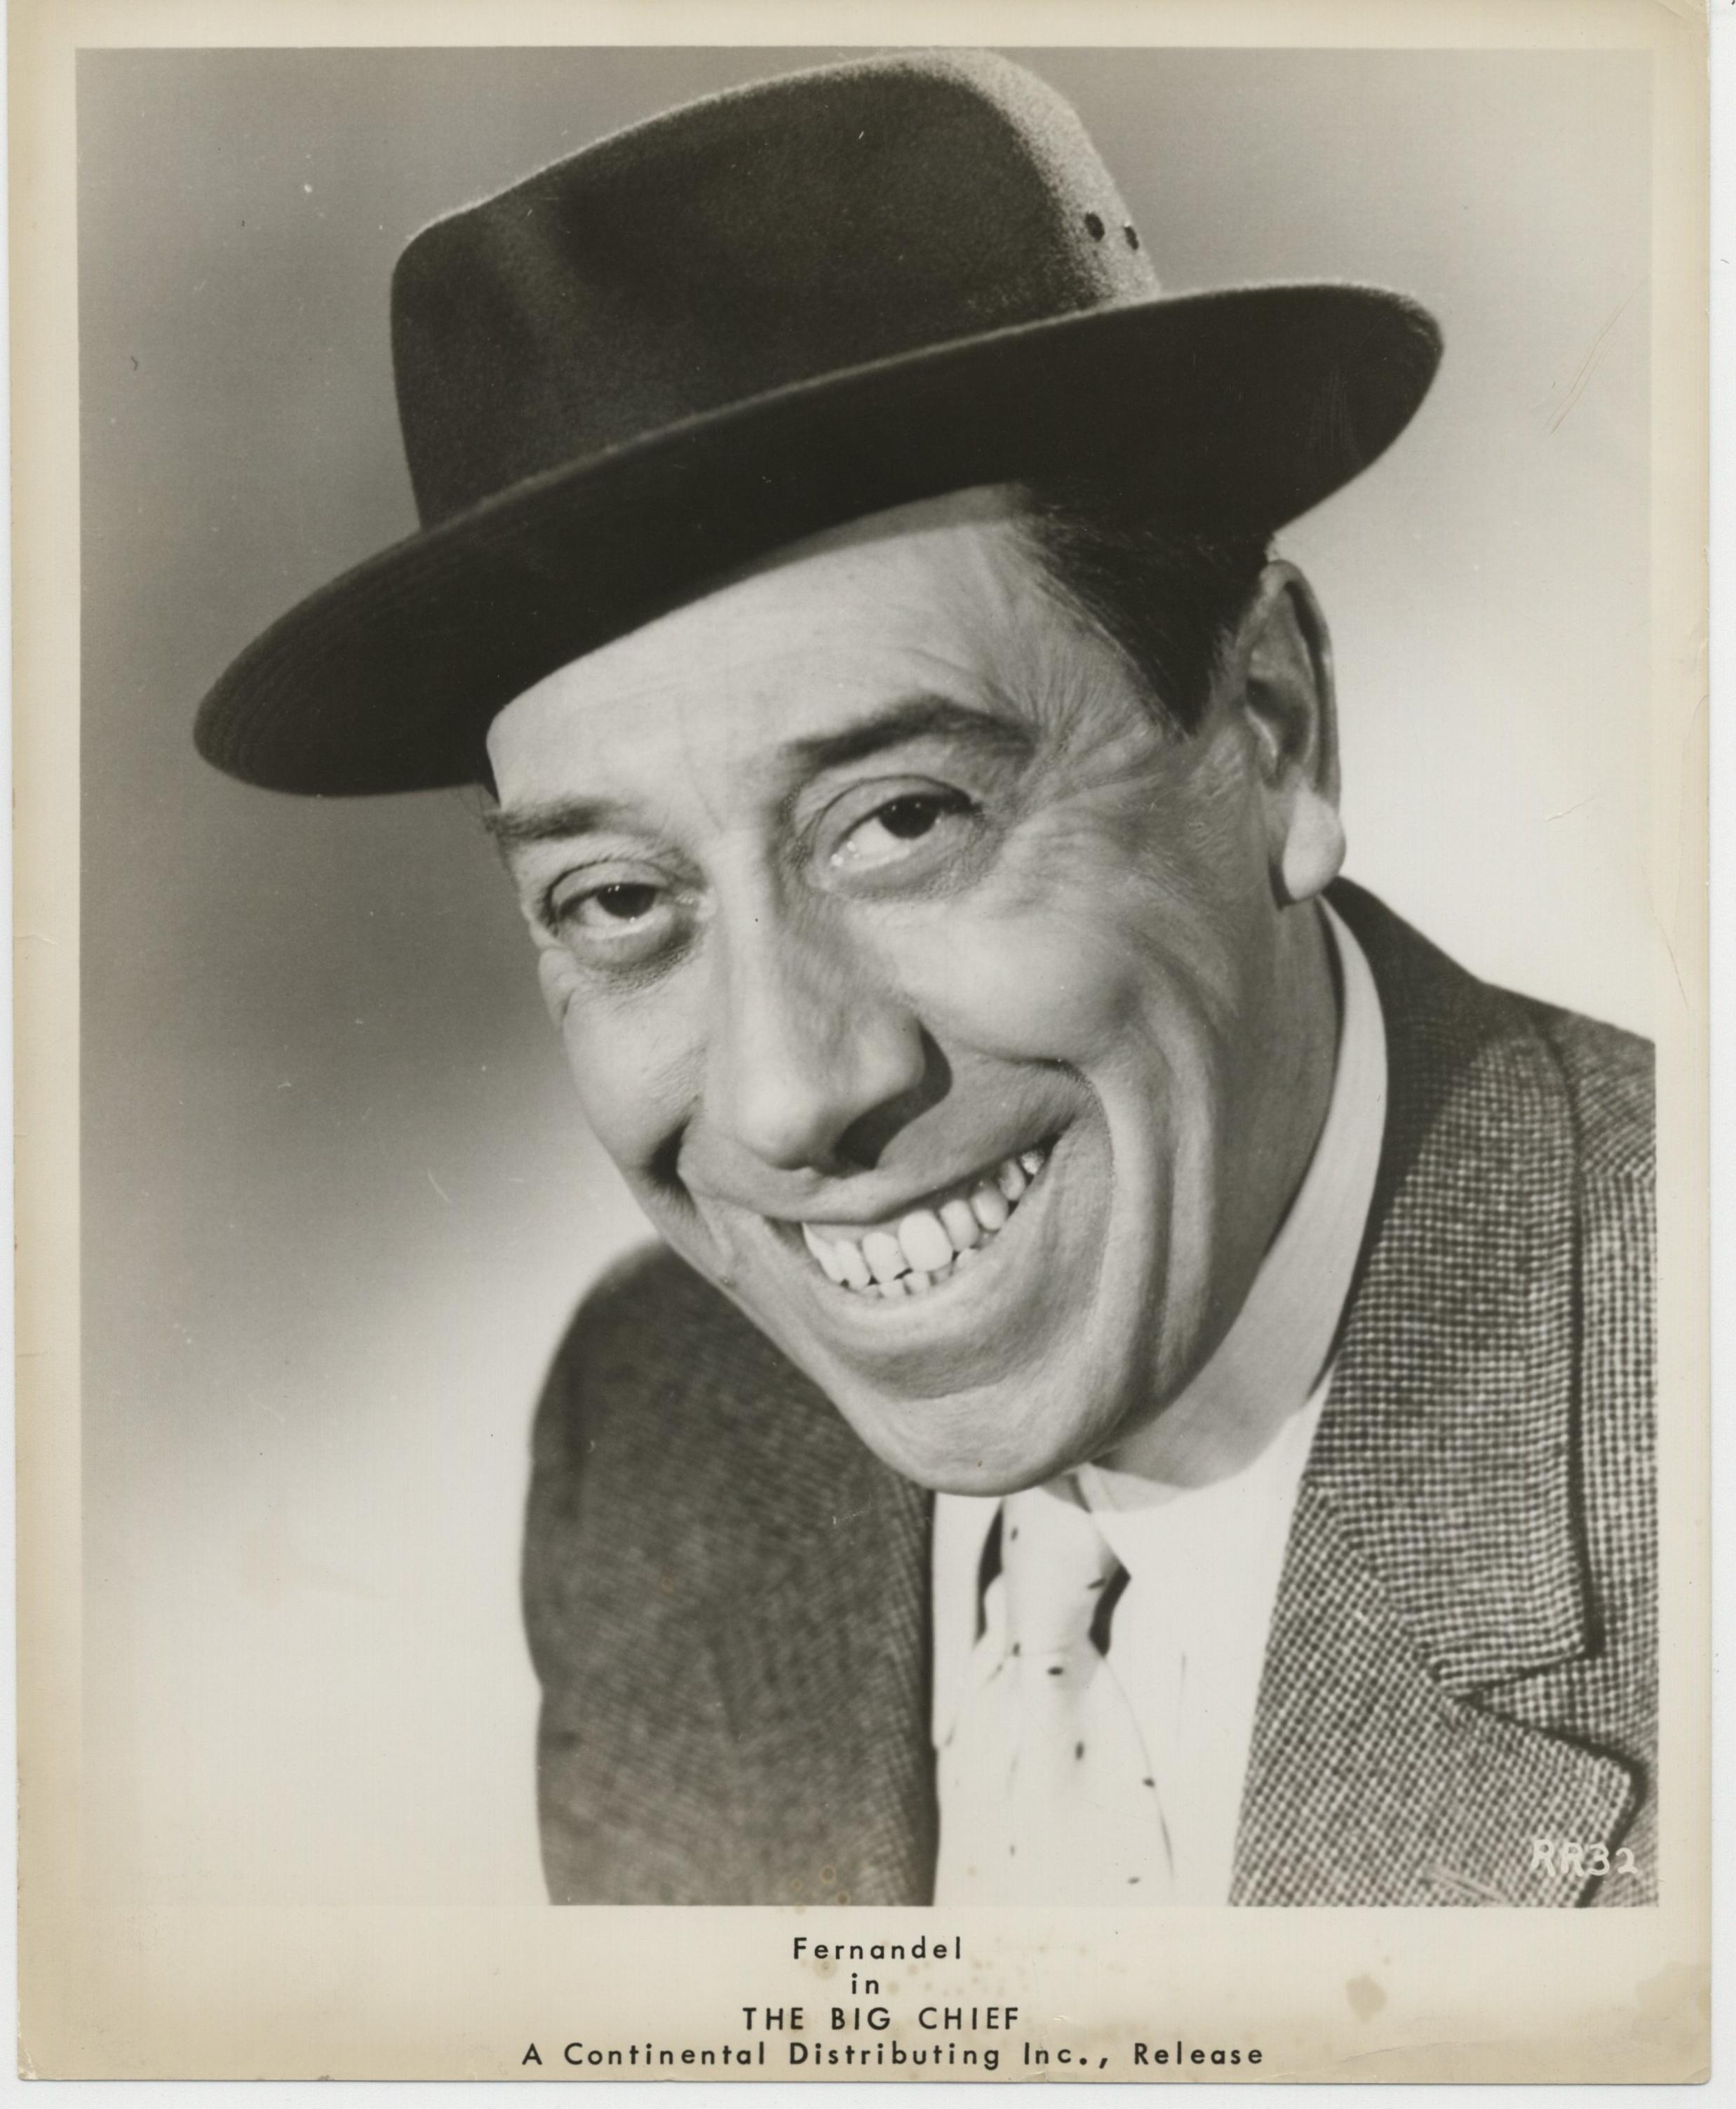 Fernandel in Le grand chef (1959)